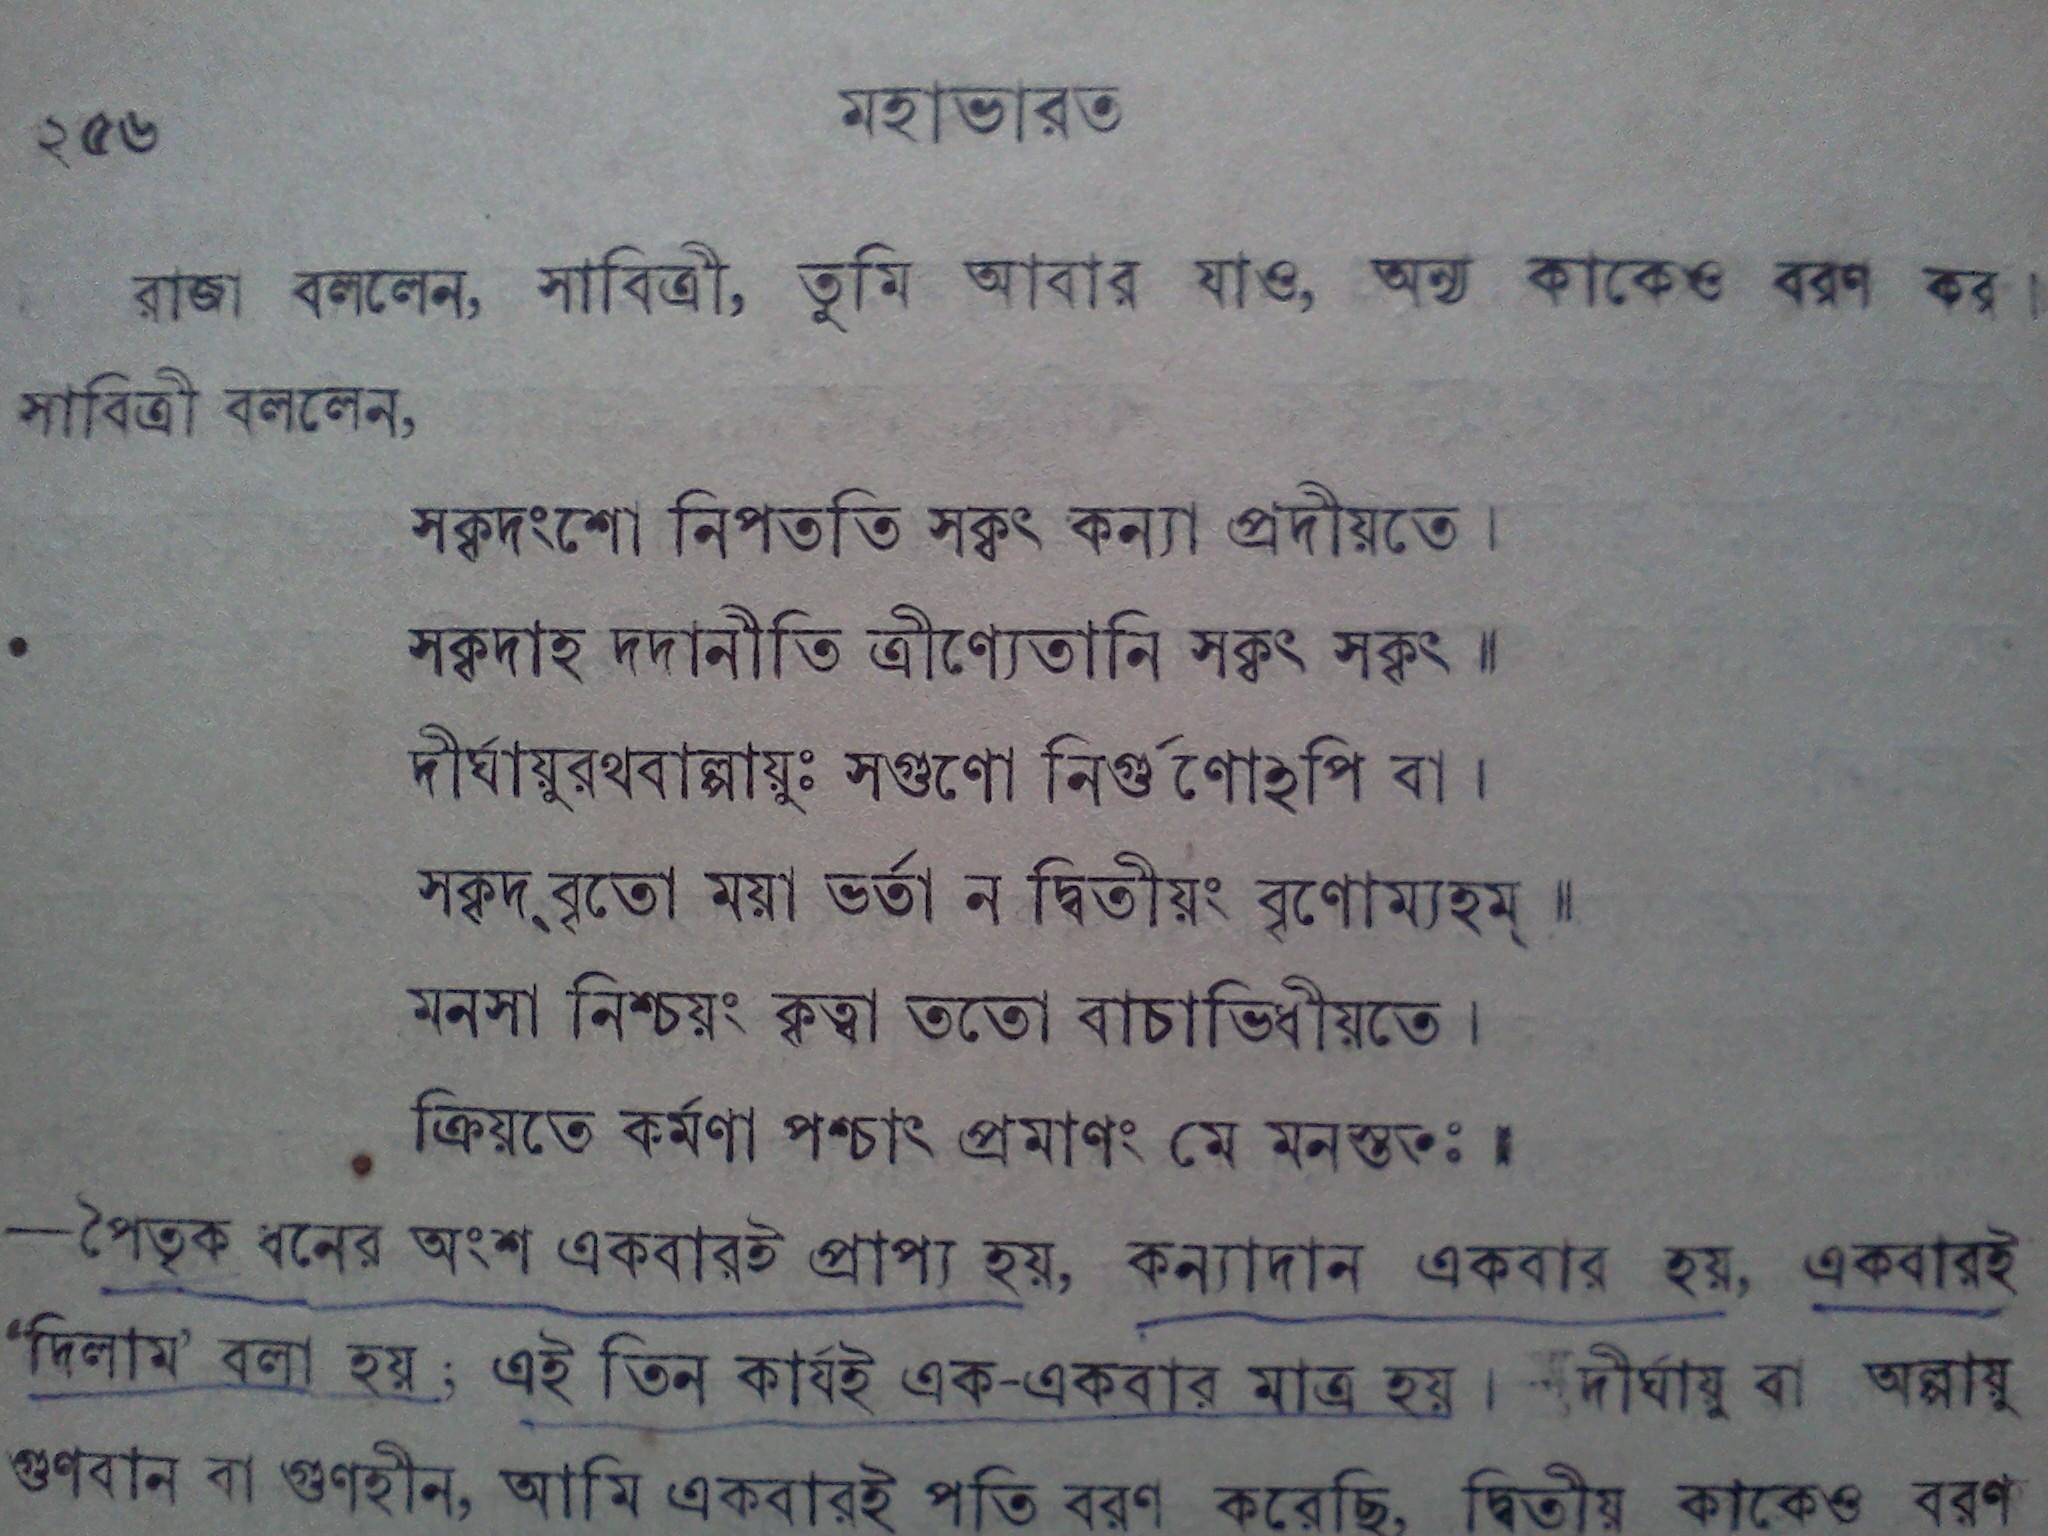 Ramayana in bengali pdf download